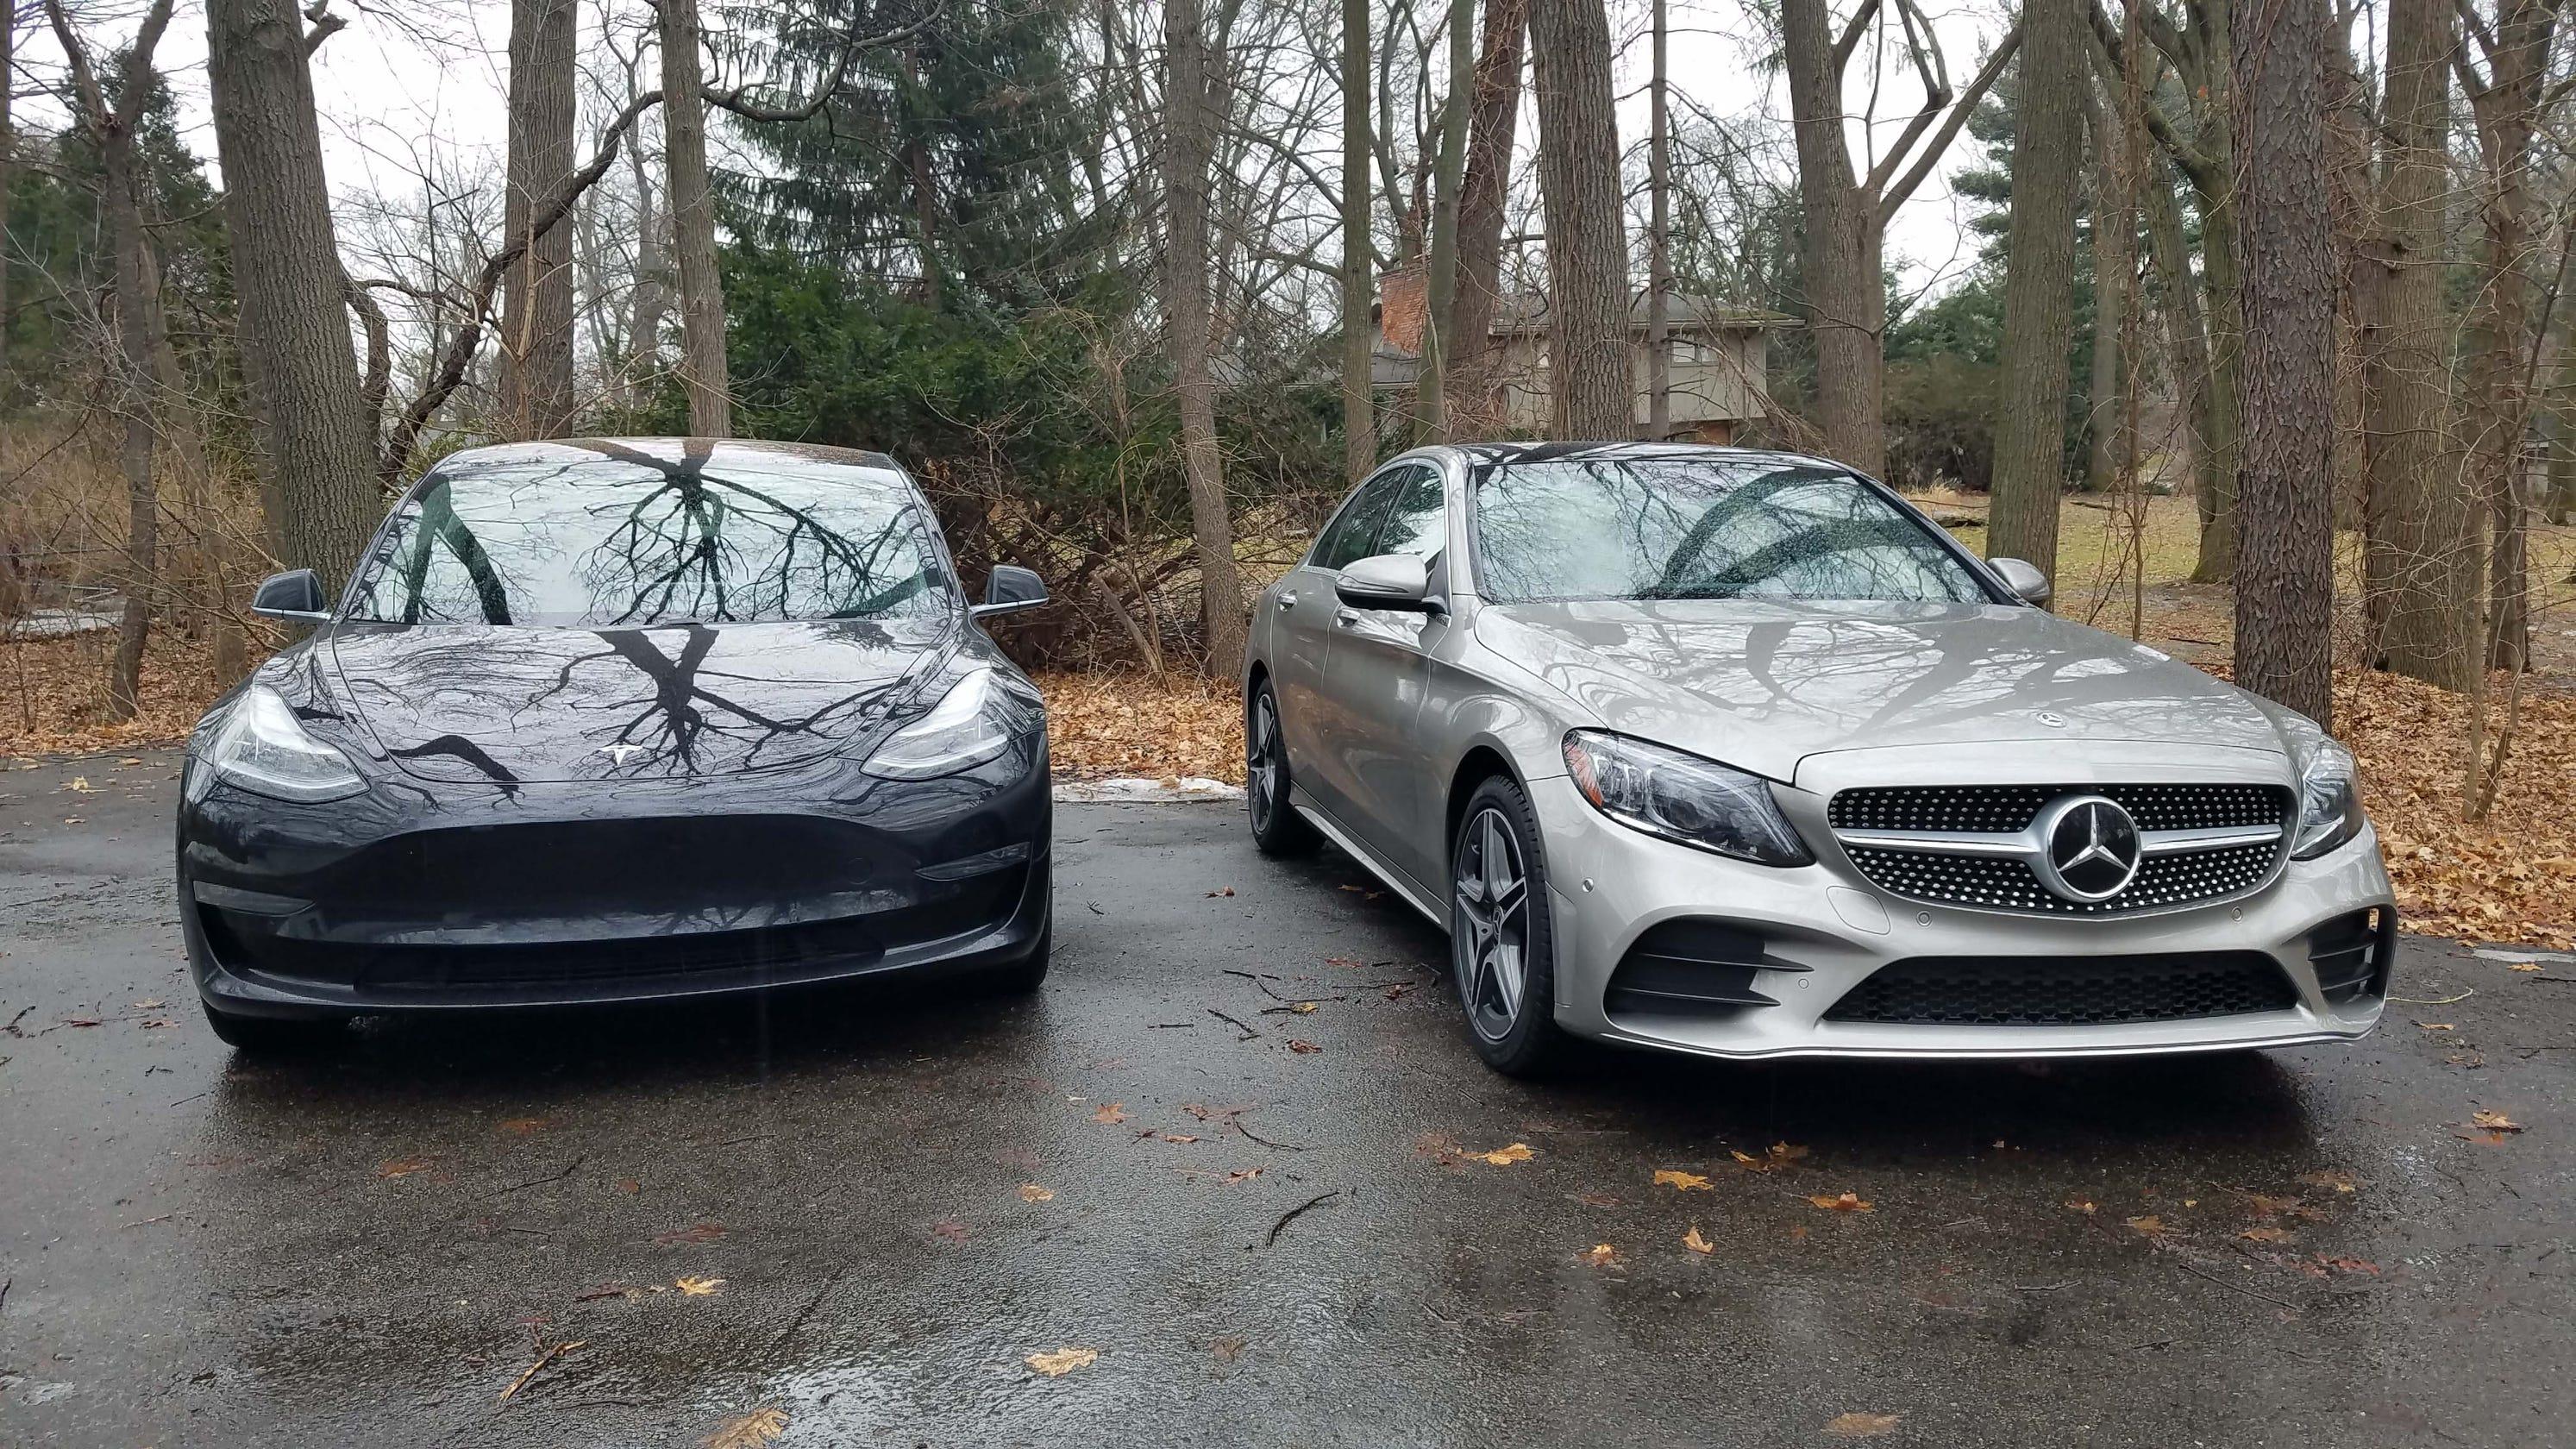 Payne: Old world Mercedes C300 vs  new age Tesla Model 3